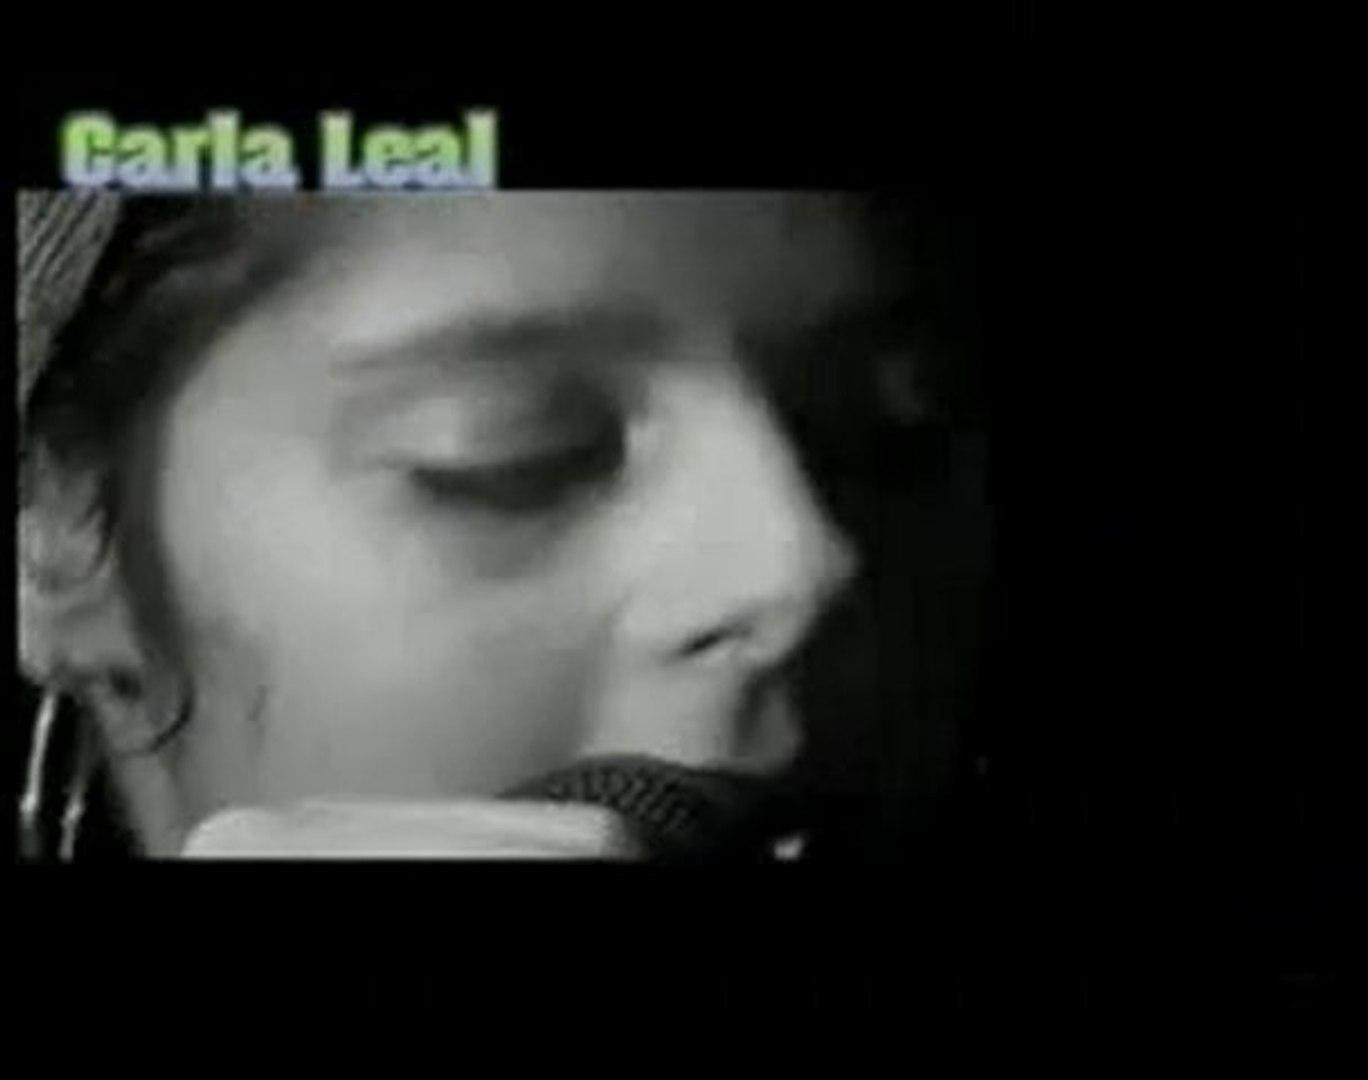 2. Carla Leal & Banda - O QUE SOBROU DO CÉU (O Rappa)